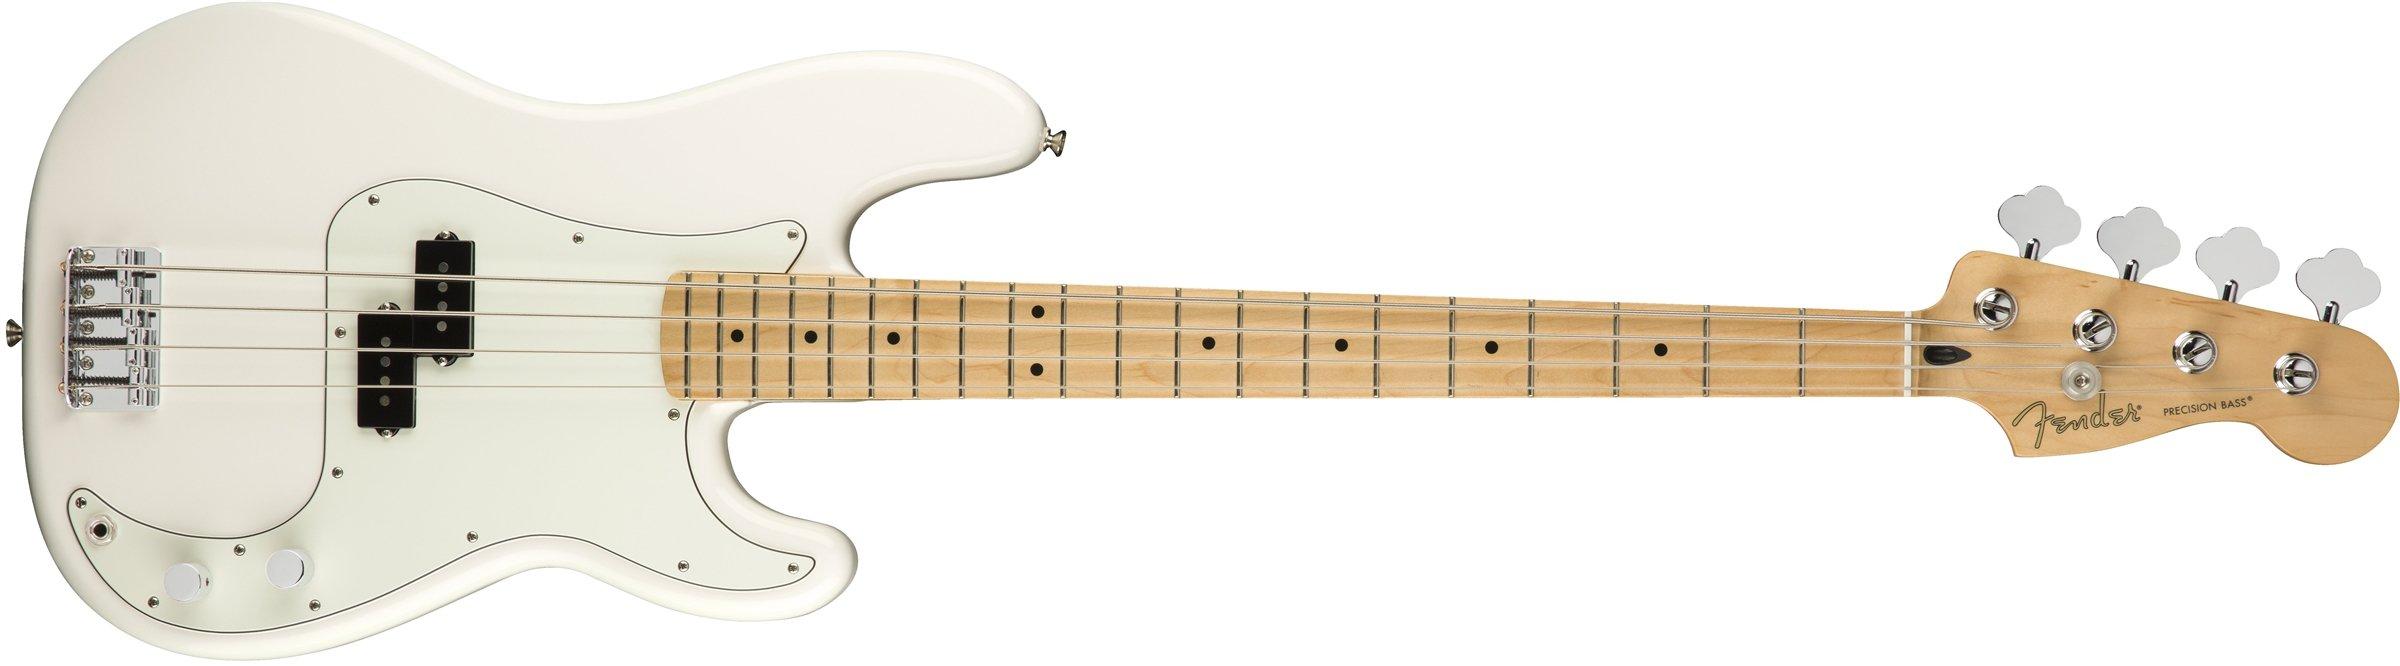 Fender Player Precision Electric Bass Guitar - Maple Fingerboard - Polar White